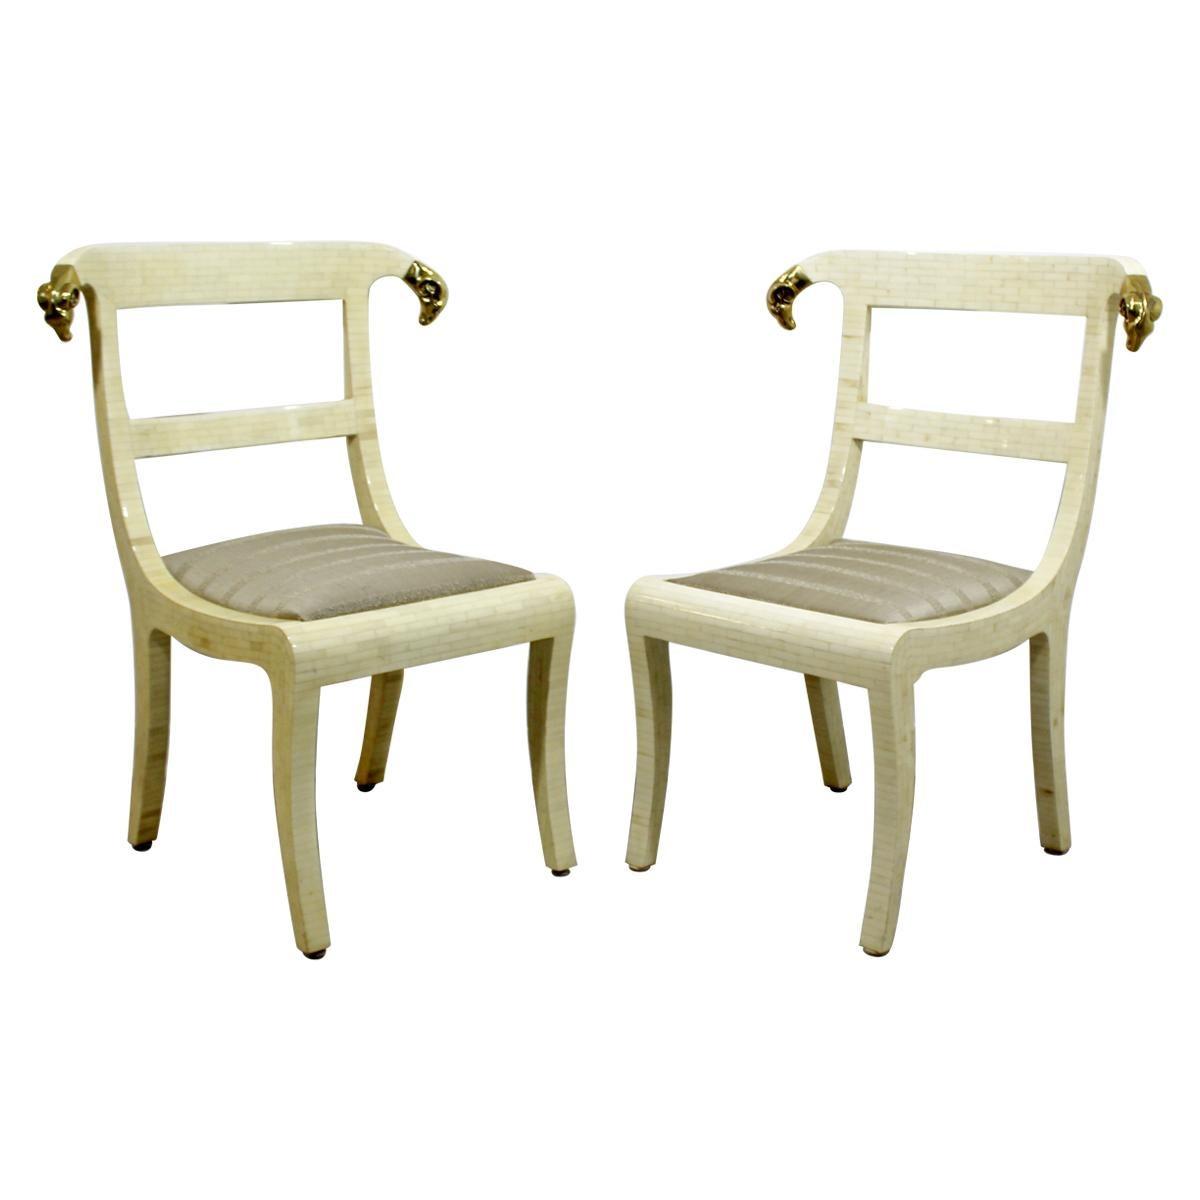 Mid-Century Modern Enrique Garcel Tessellated Stone Brass Rams Head Chairs, Pair